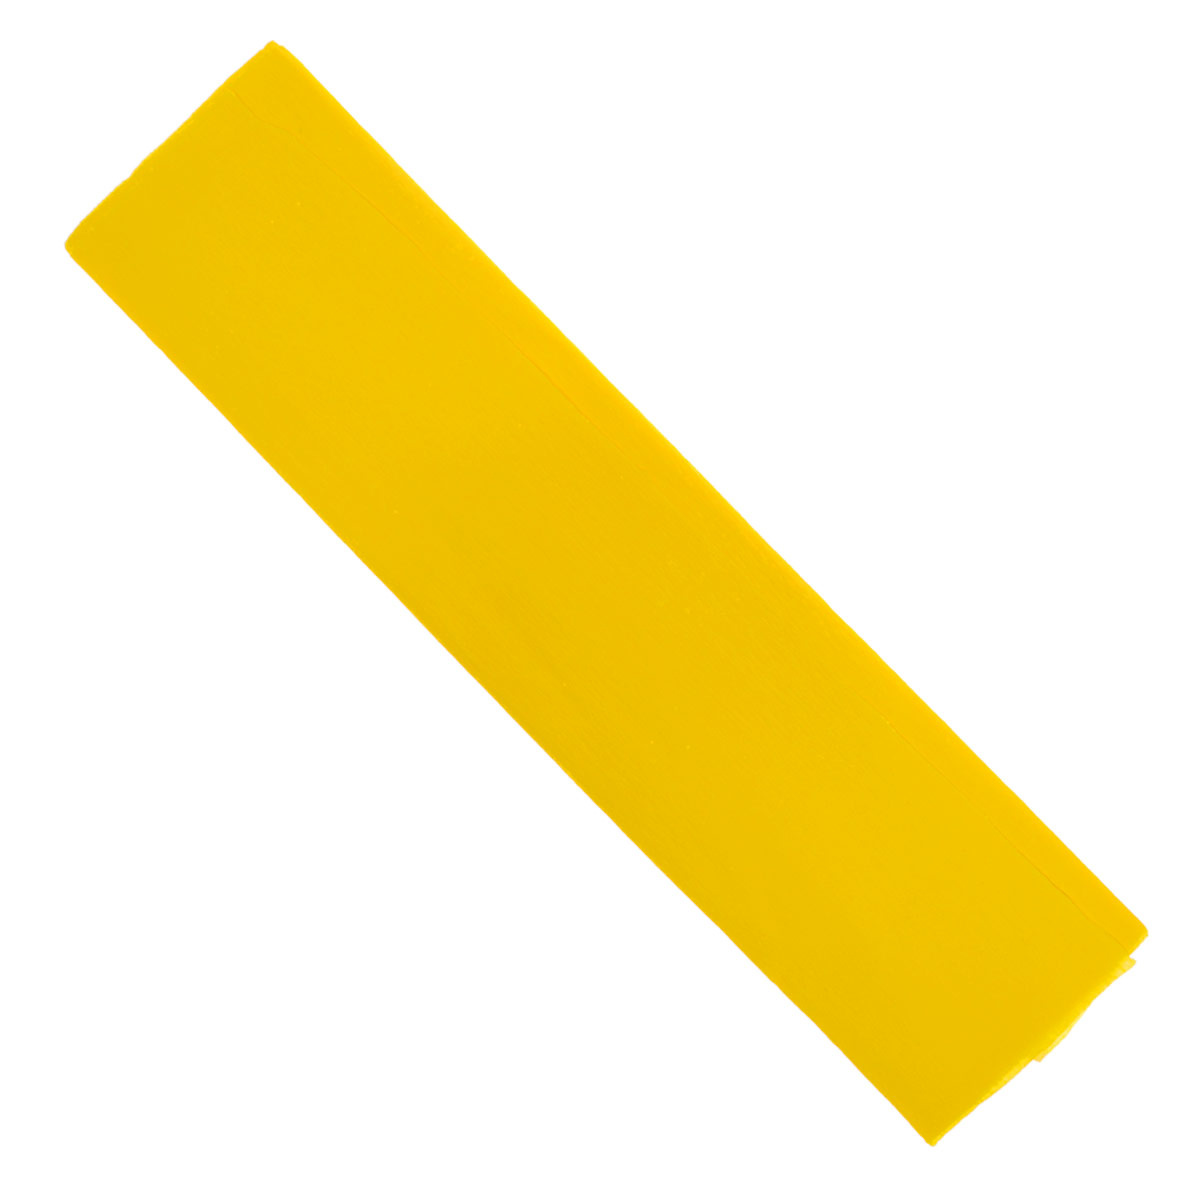 "Крепированная бумага ""Hatber"", флюоресцентная, цвет: желтый, 5 см х 25 см  #1"